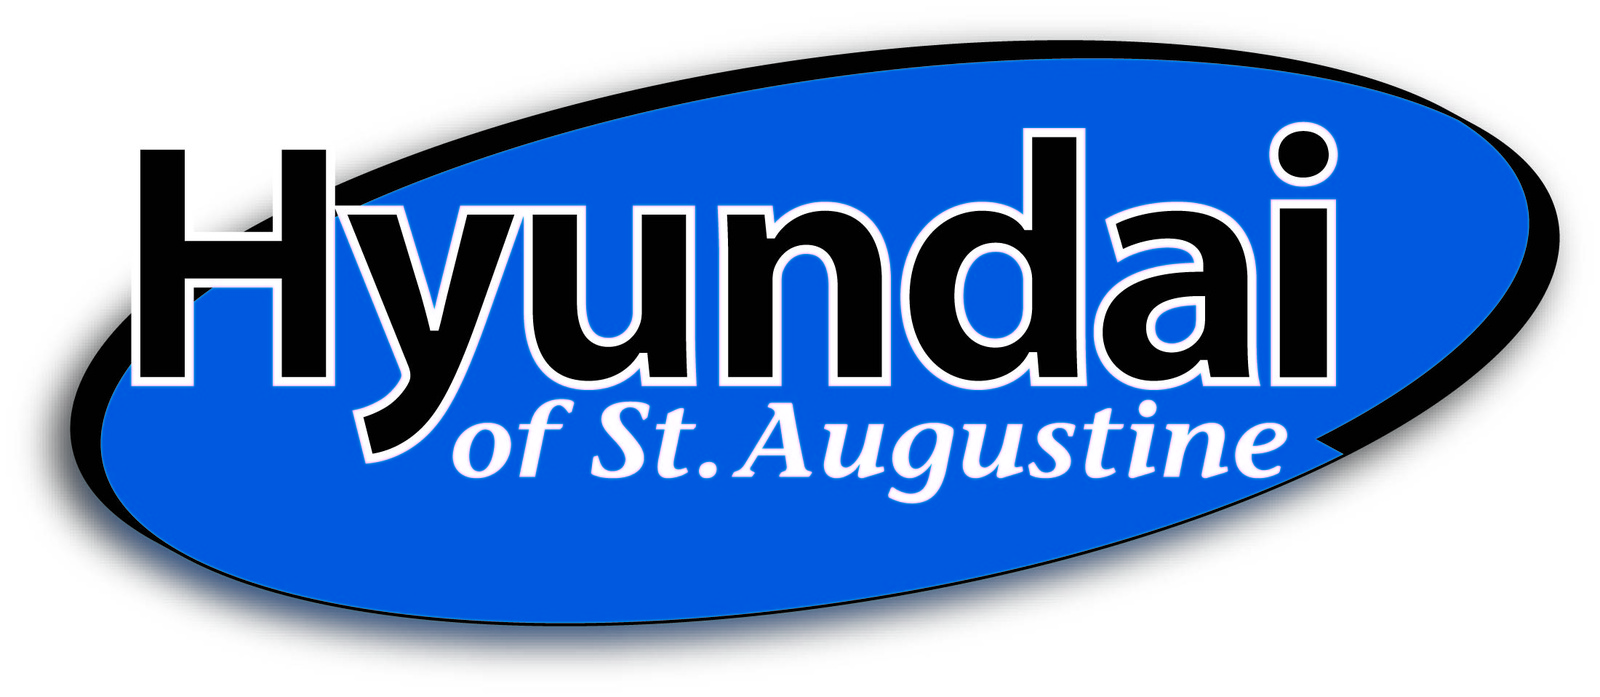 Hyundai Of St Augustine >> Hyundai Of St Augustine Saint Augustine Fl Read Consumer